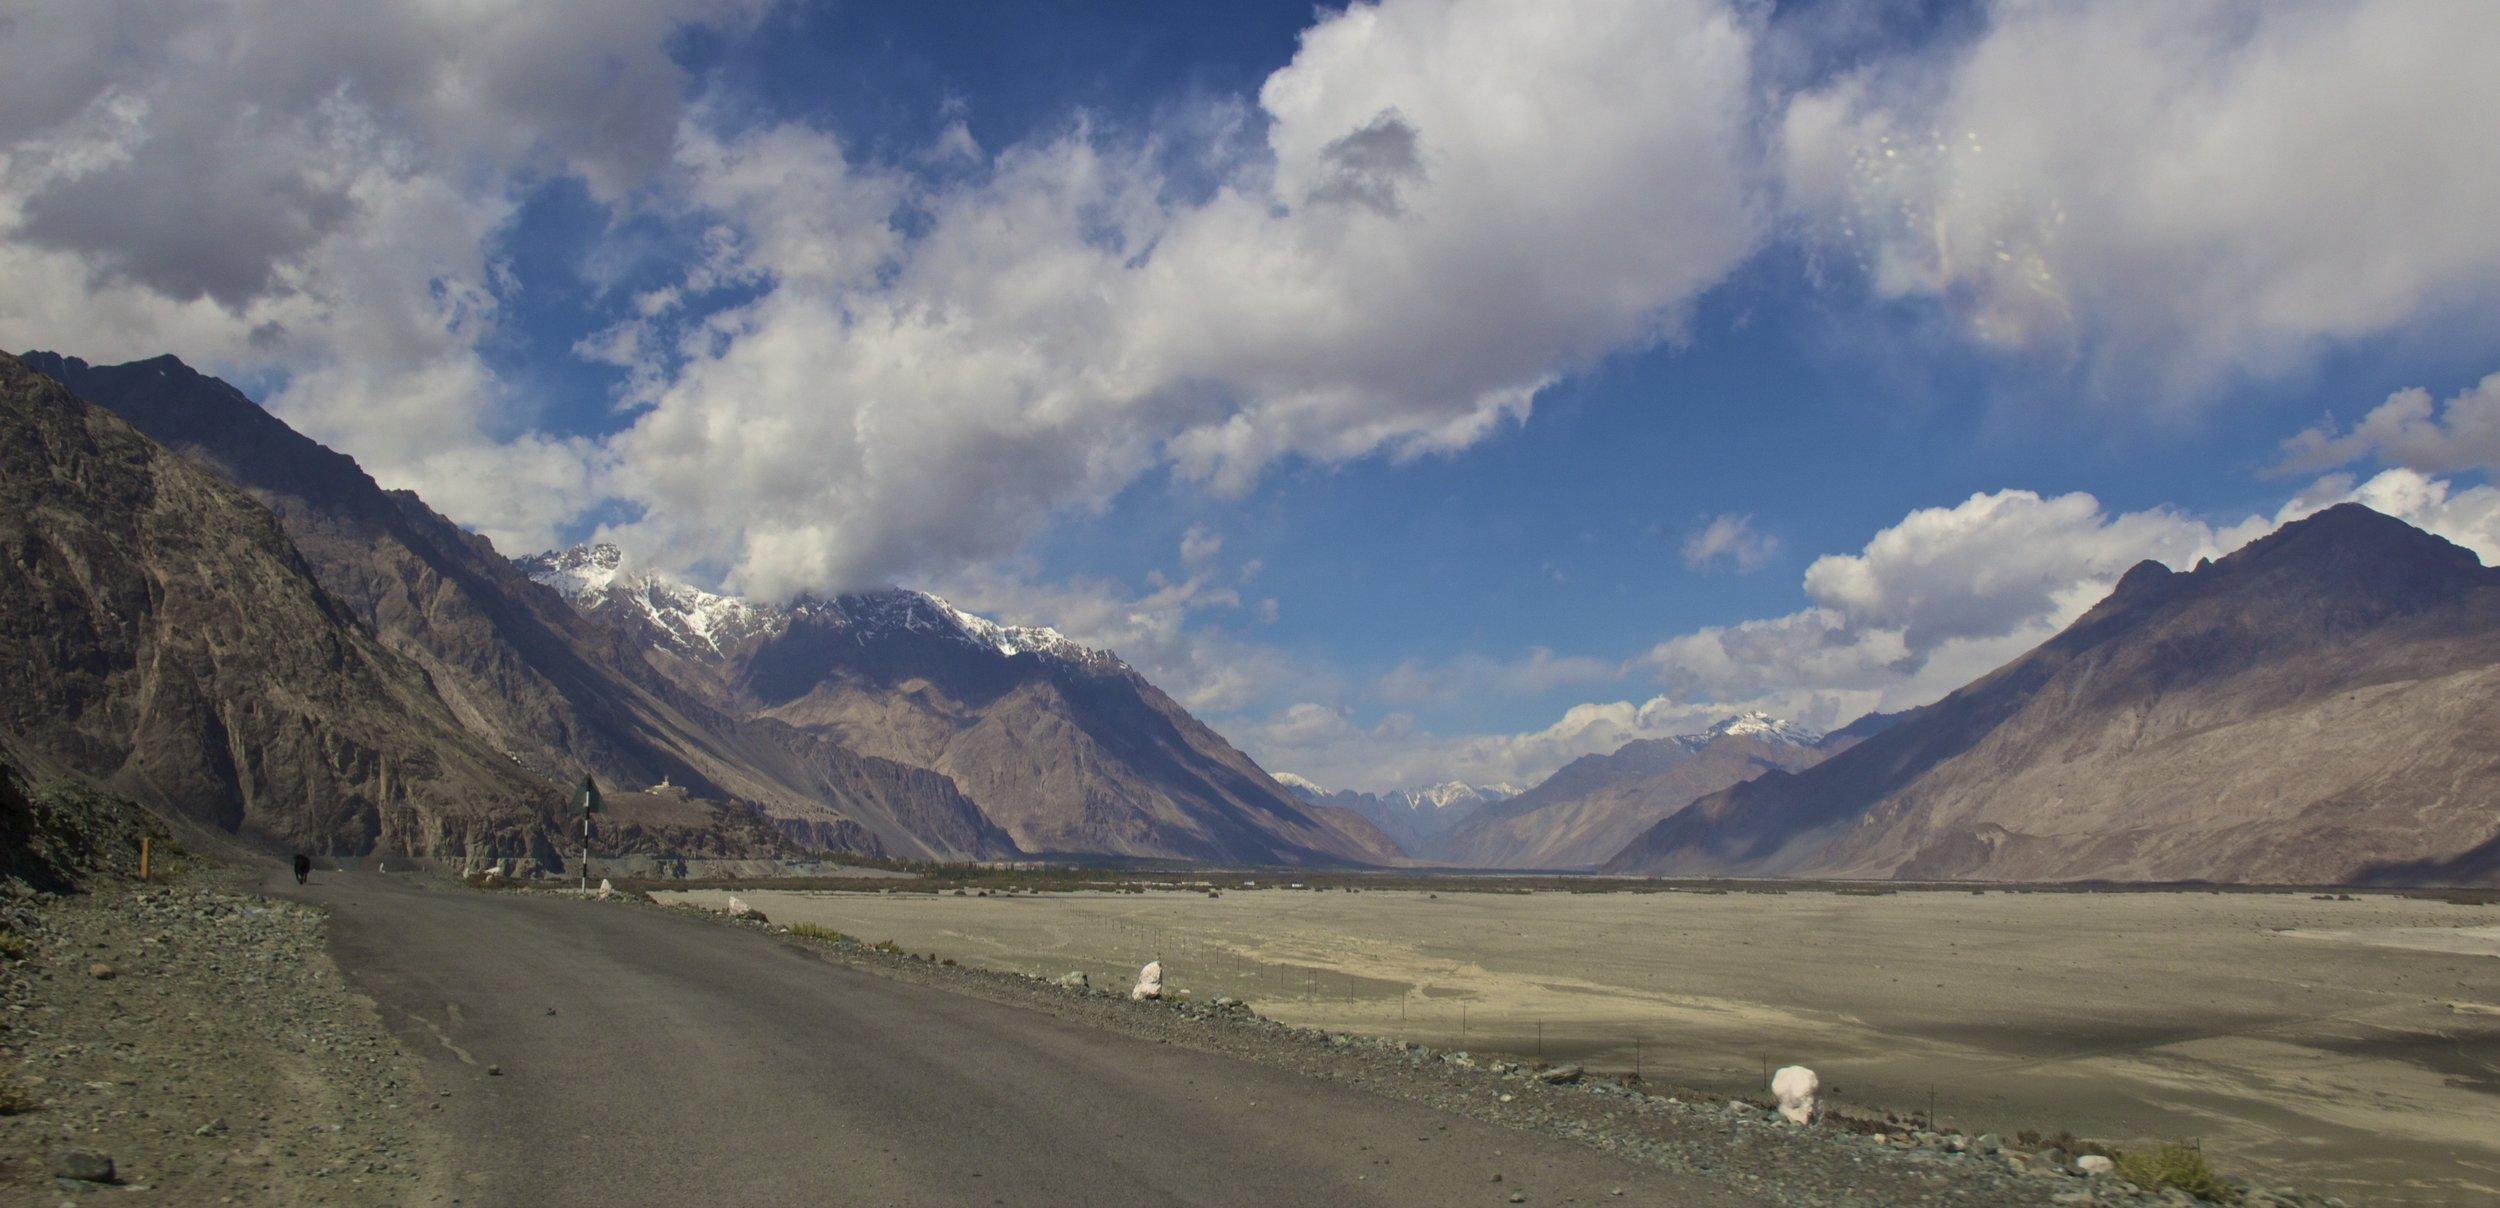 Nubra Valley Ladakh Kashmir Indian Himalayas Roads 6.jpg